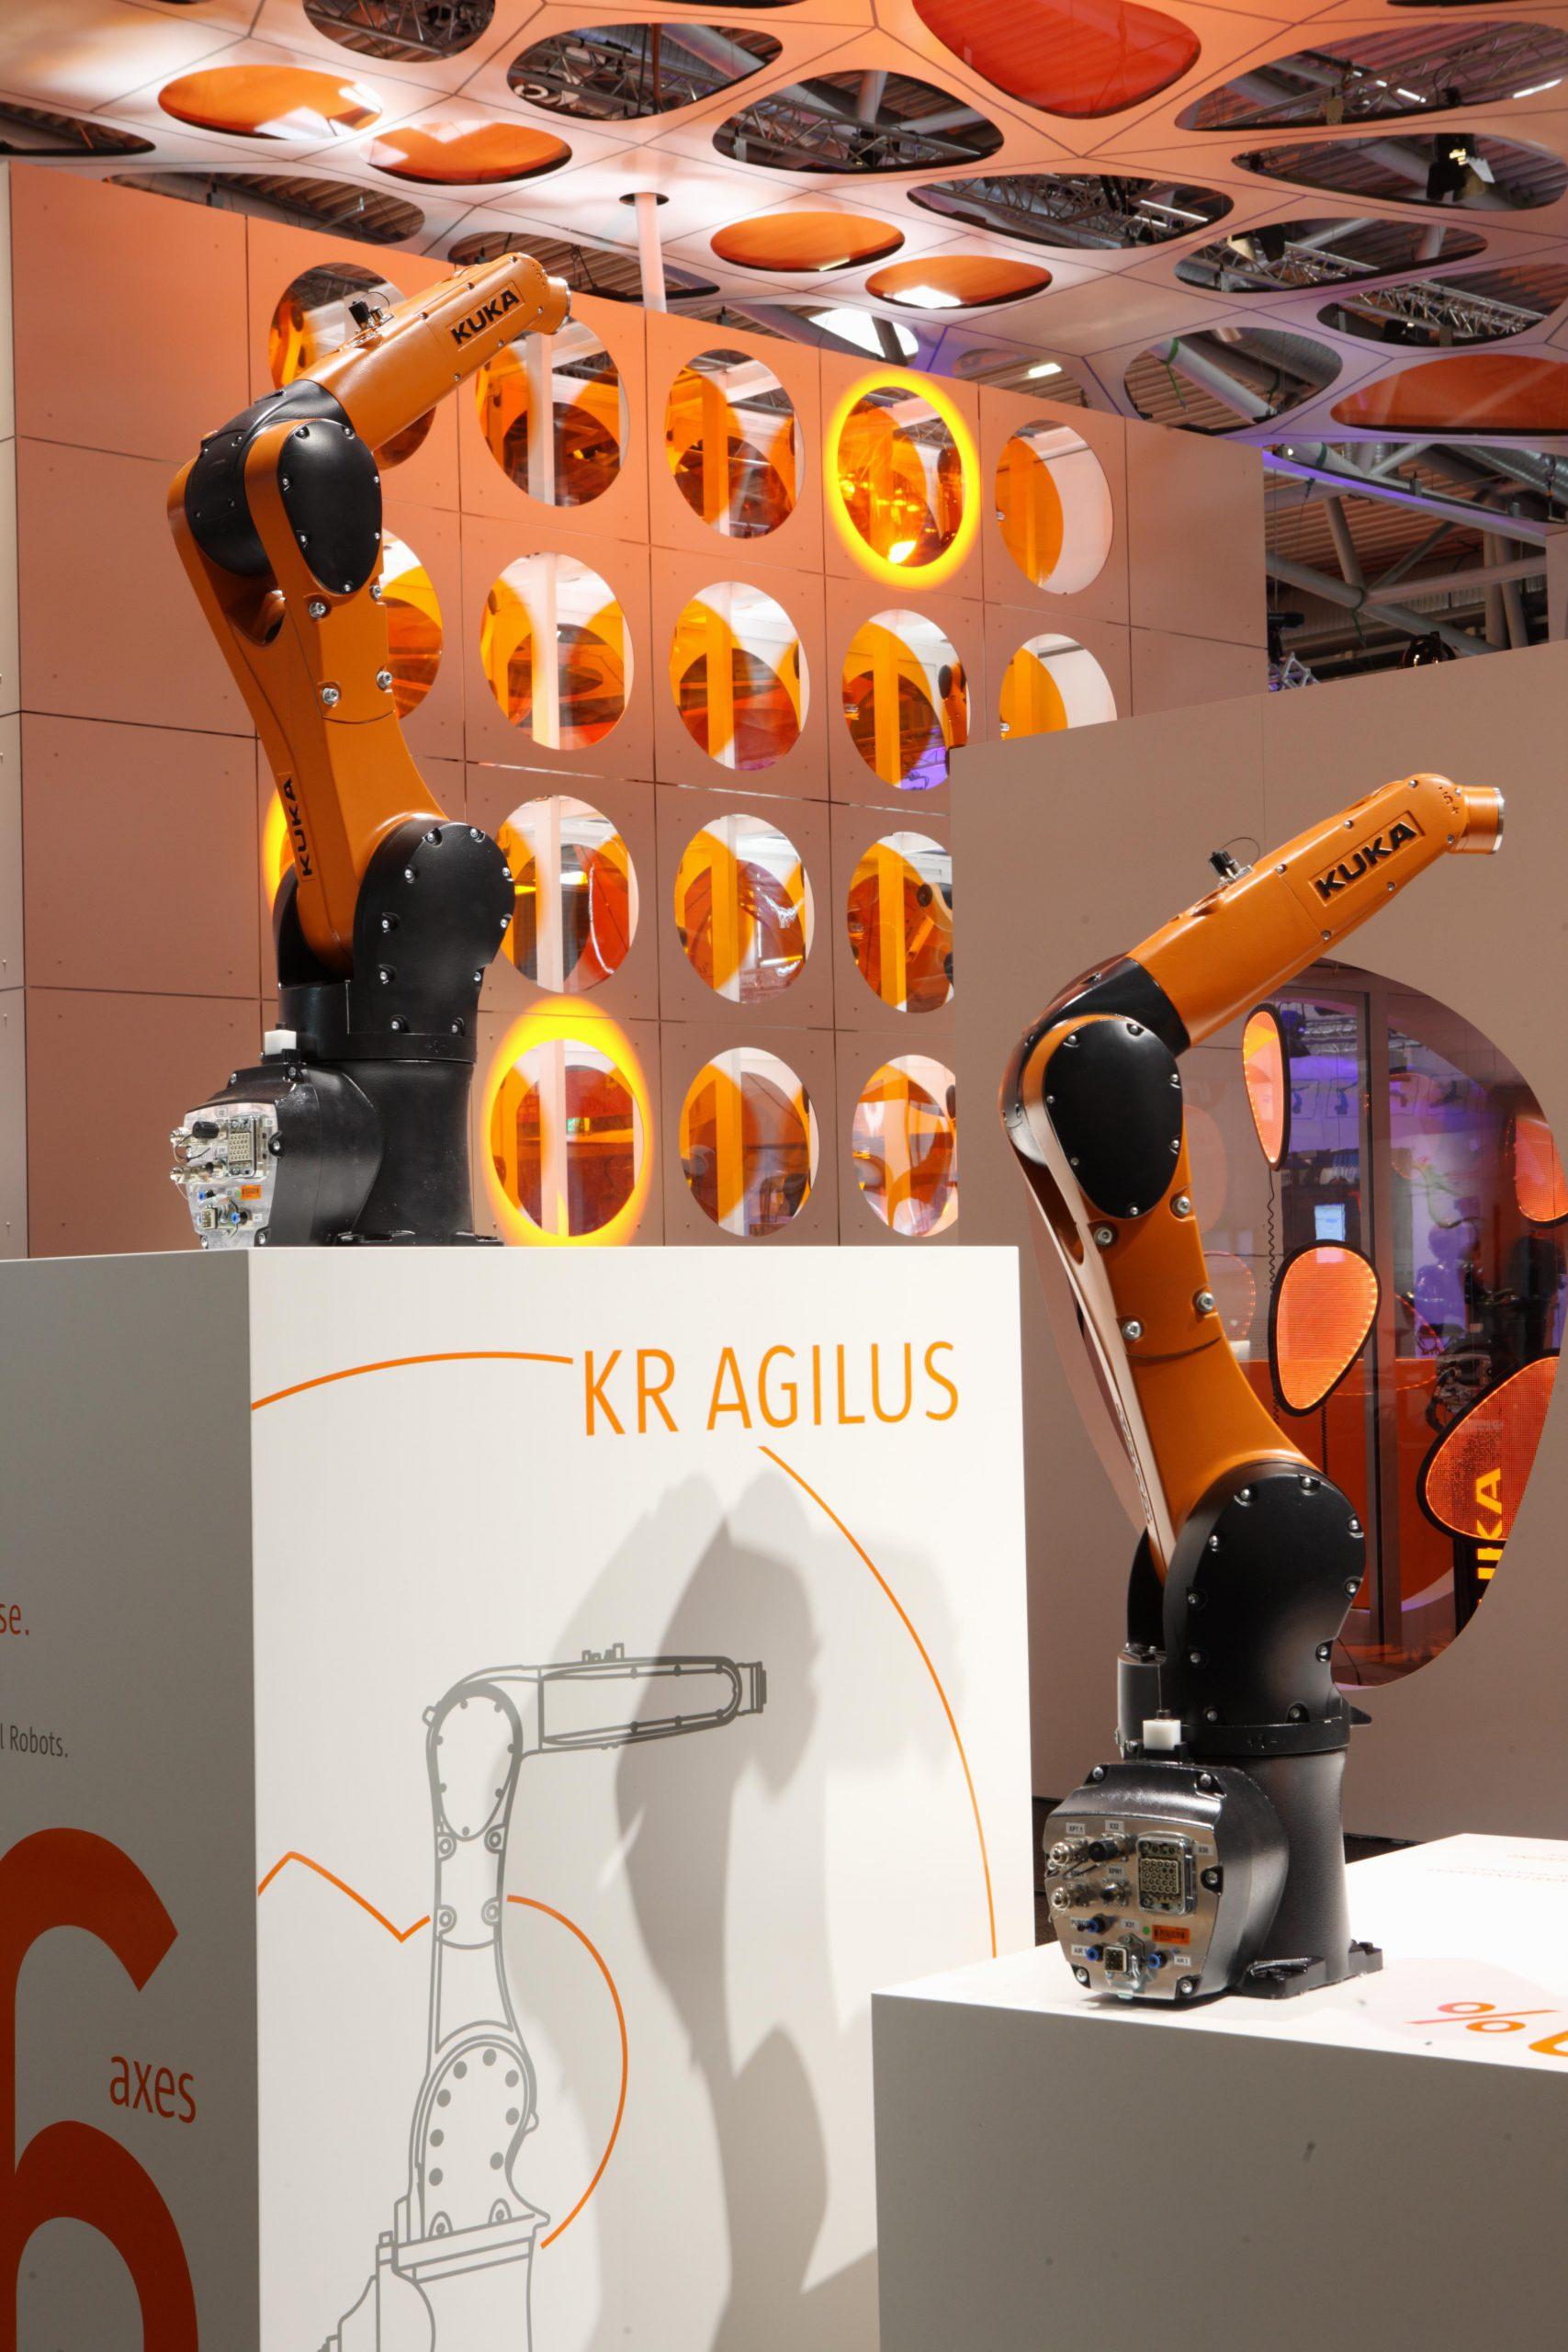 KUKA KR 6 R900 sixx WP (KR AGILUS)-5